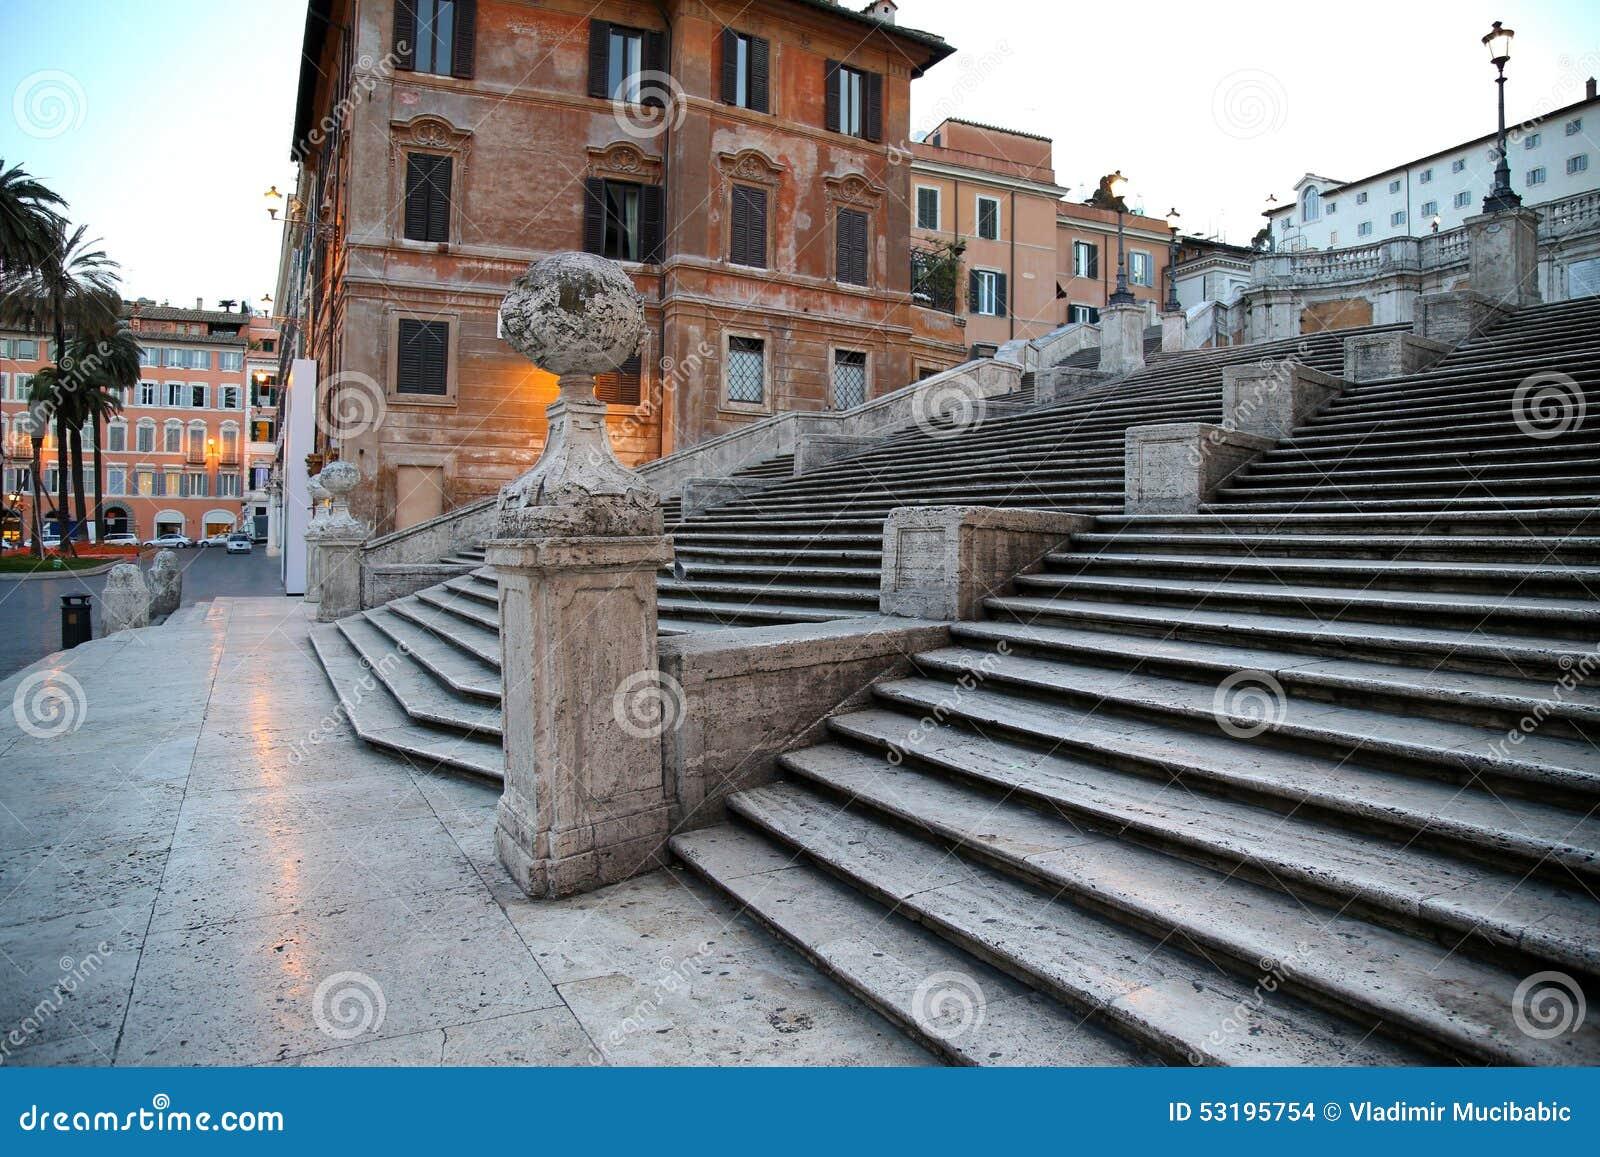 Cuadrado español con pasos españoles en Roma Italia